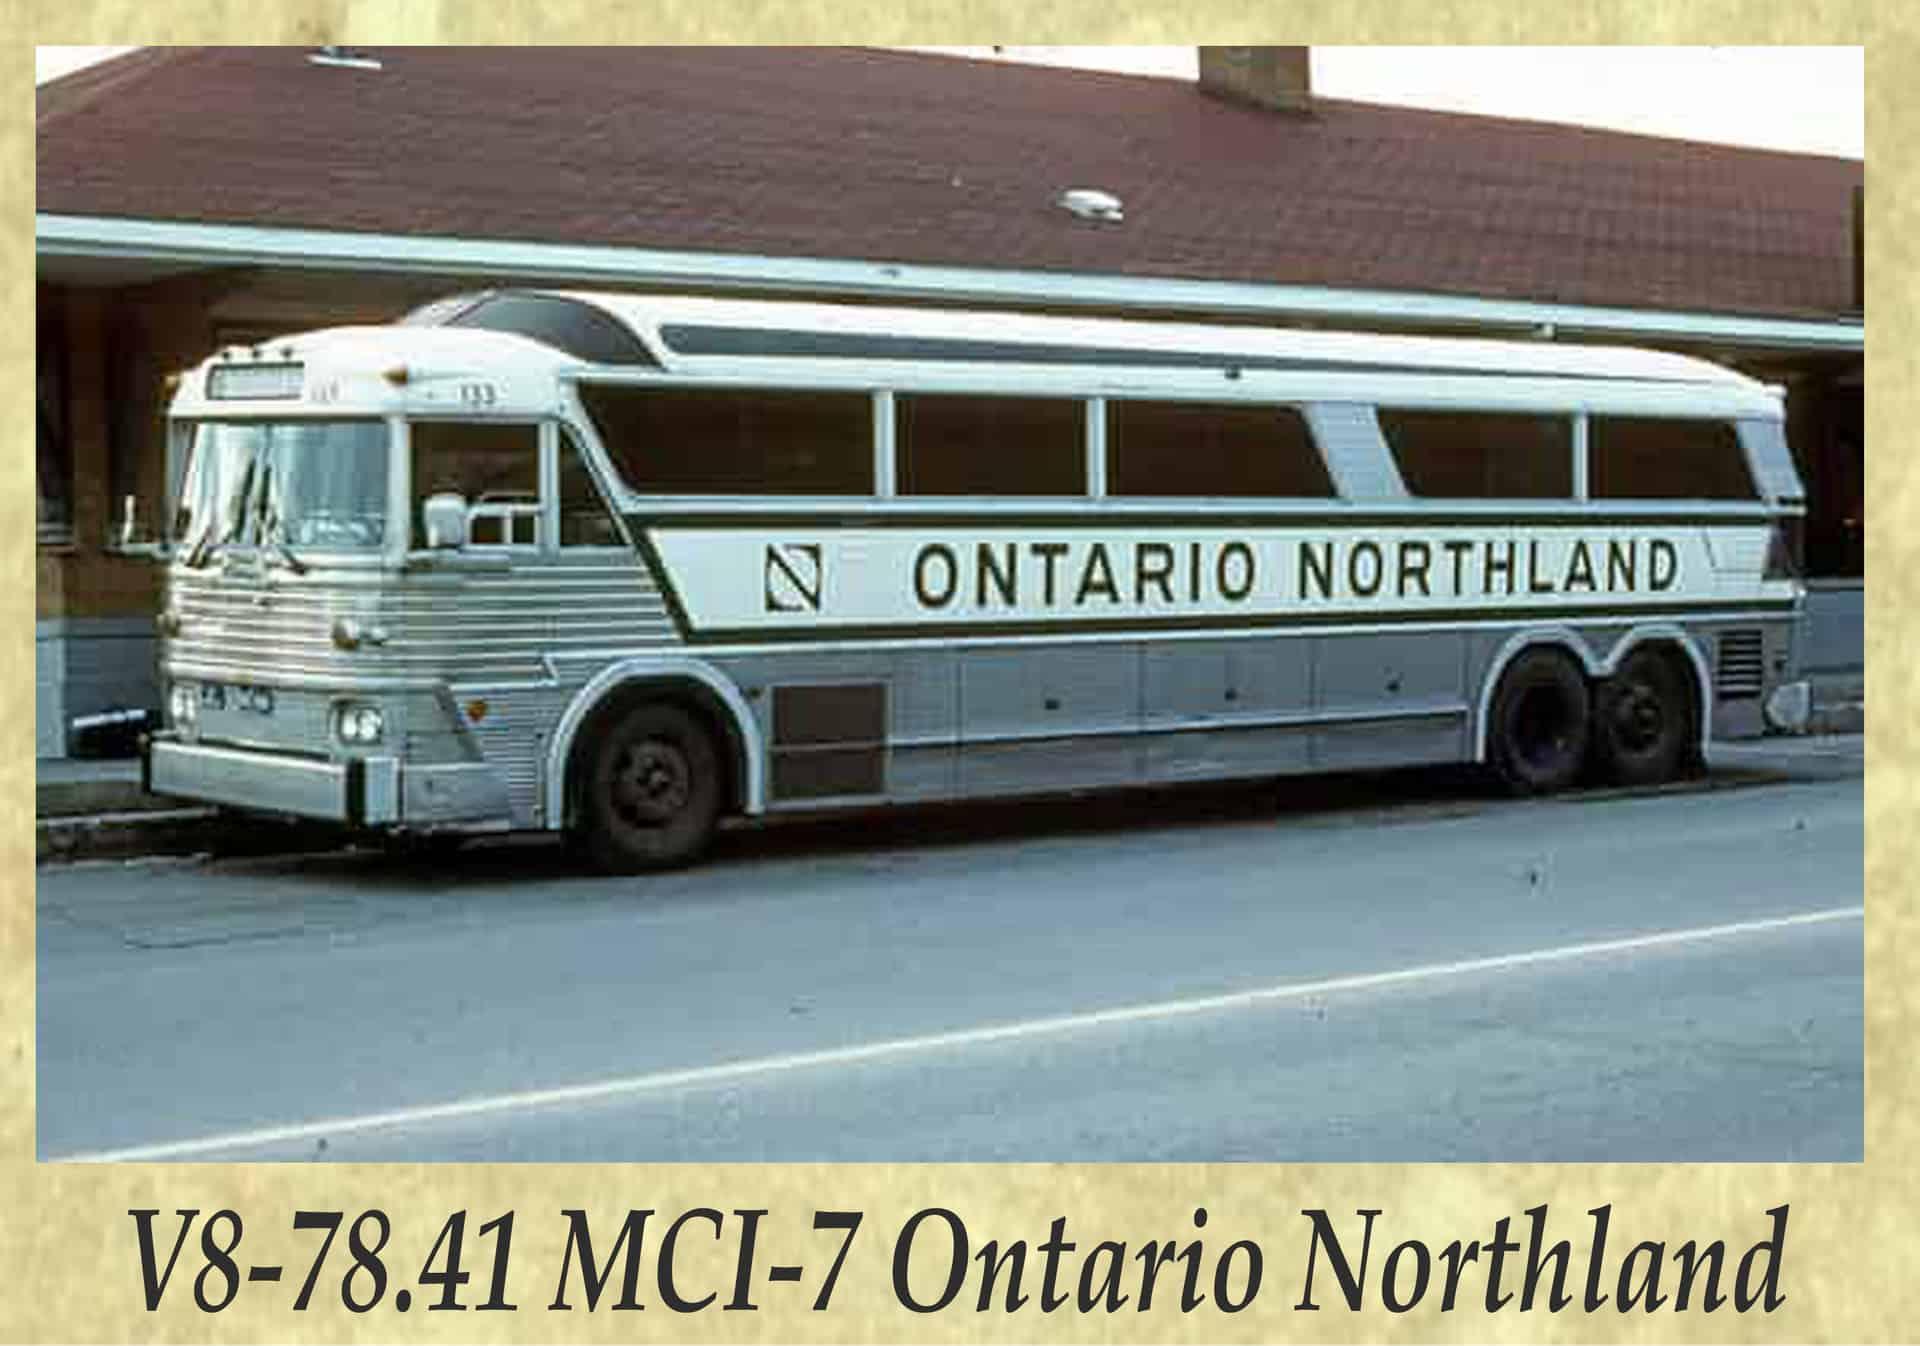 V8-78.41 MCI-7 Ontario Northland